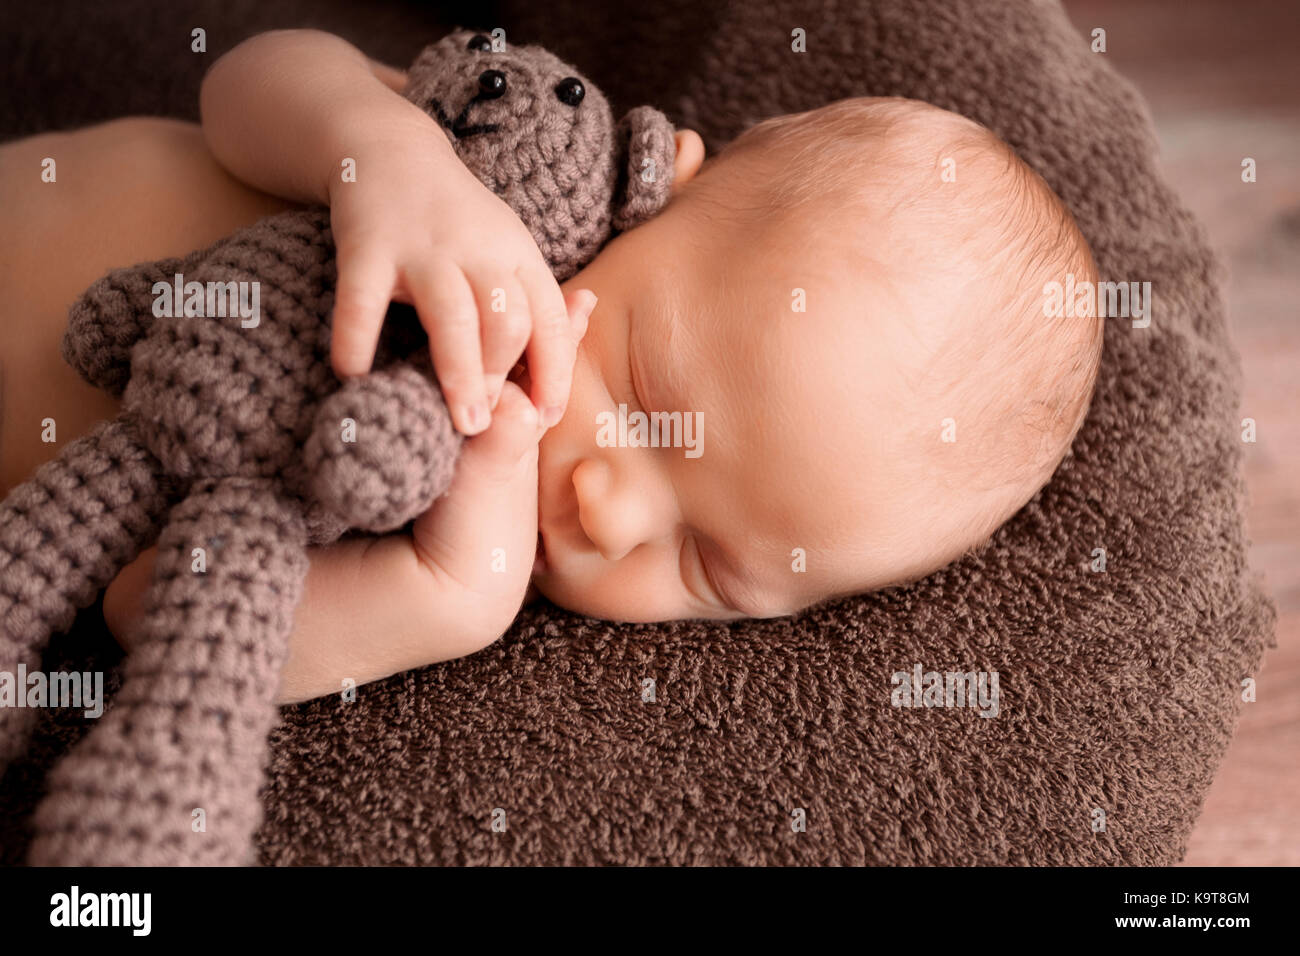 Bebé recién nacido duerme en un hermoso posa con un pequeño oso Imagen De Stock